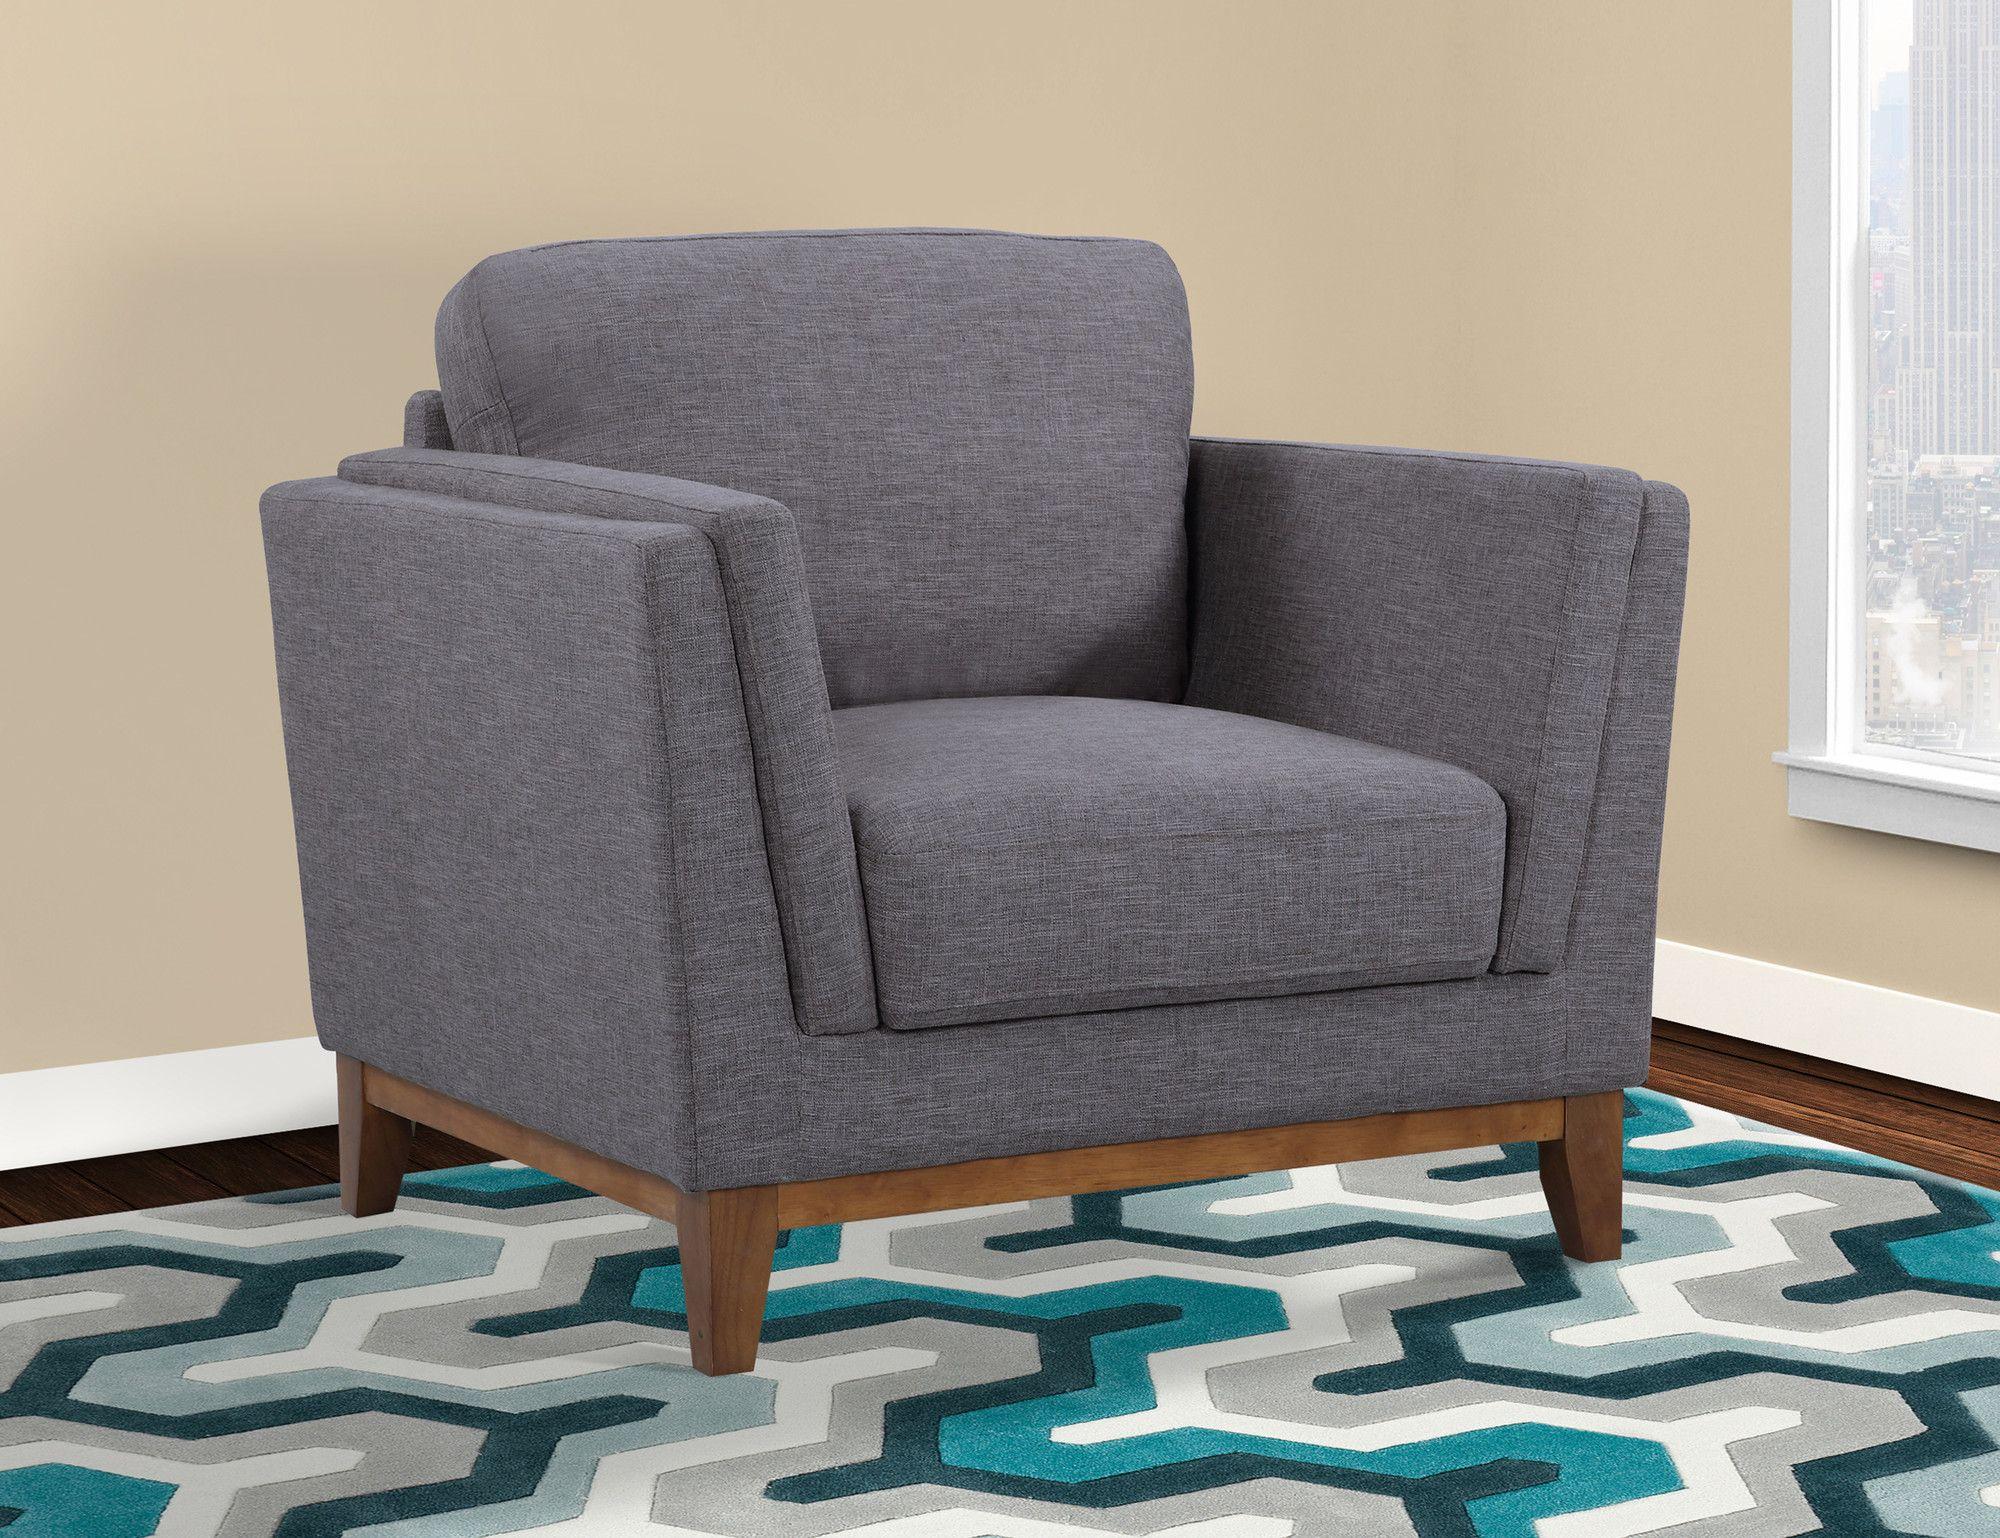 Marvelous Artifore Modern Armchair Products Modern Chairs Inzonedesignstudio Interior Chair Design Inzonedesignstudiocom